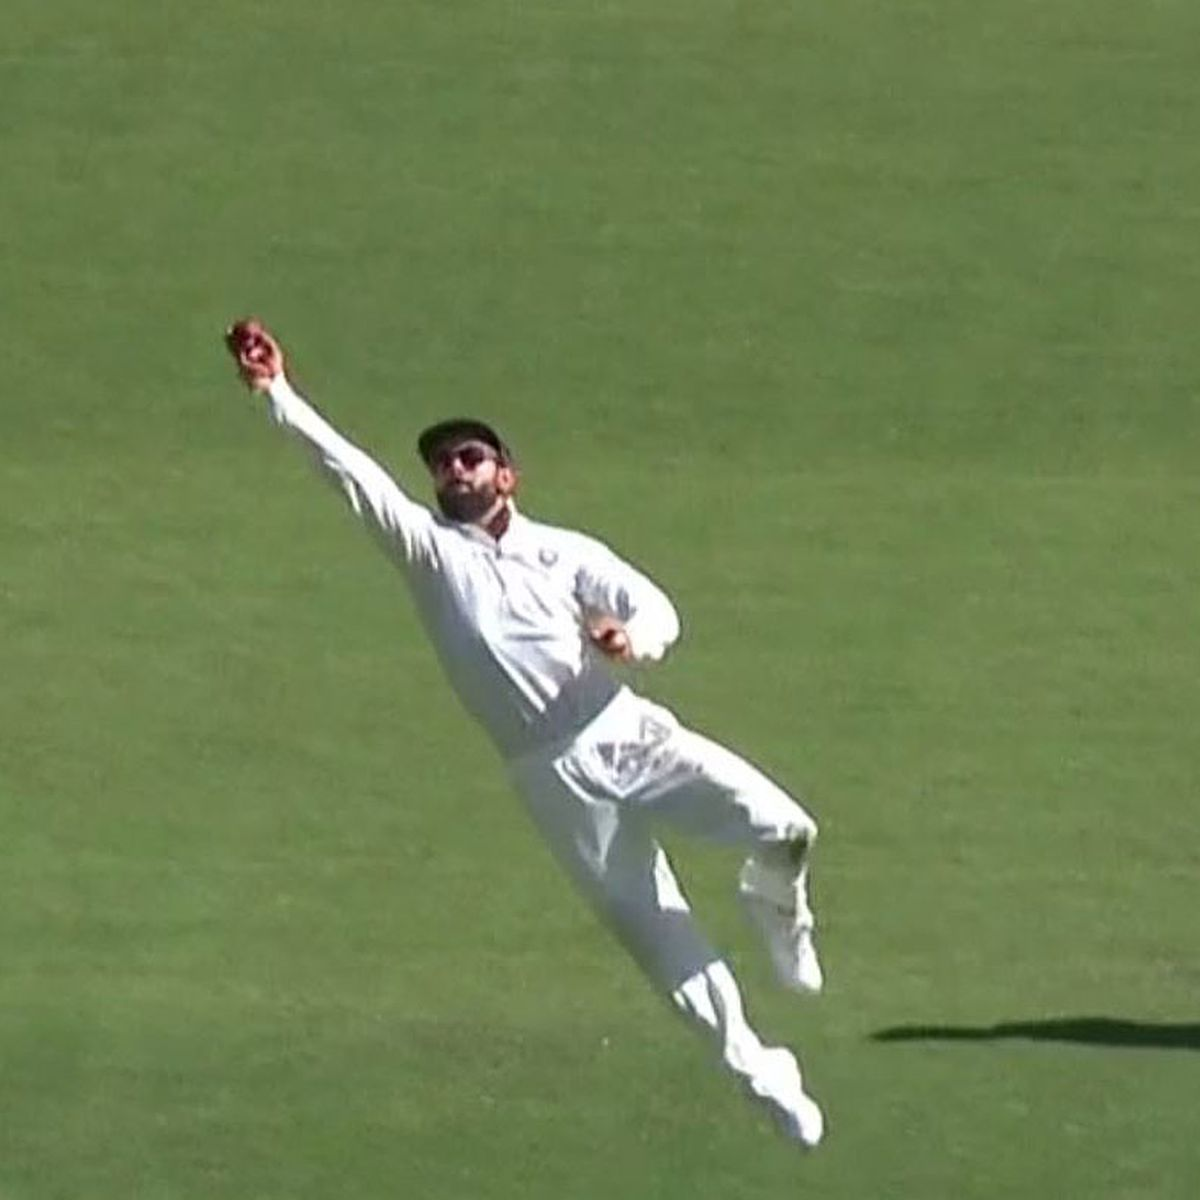 Australia v India: Virat Kohli rivals Usman Khawaja with incredible one-handed diving catch, video